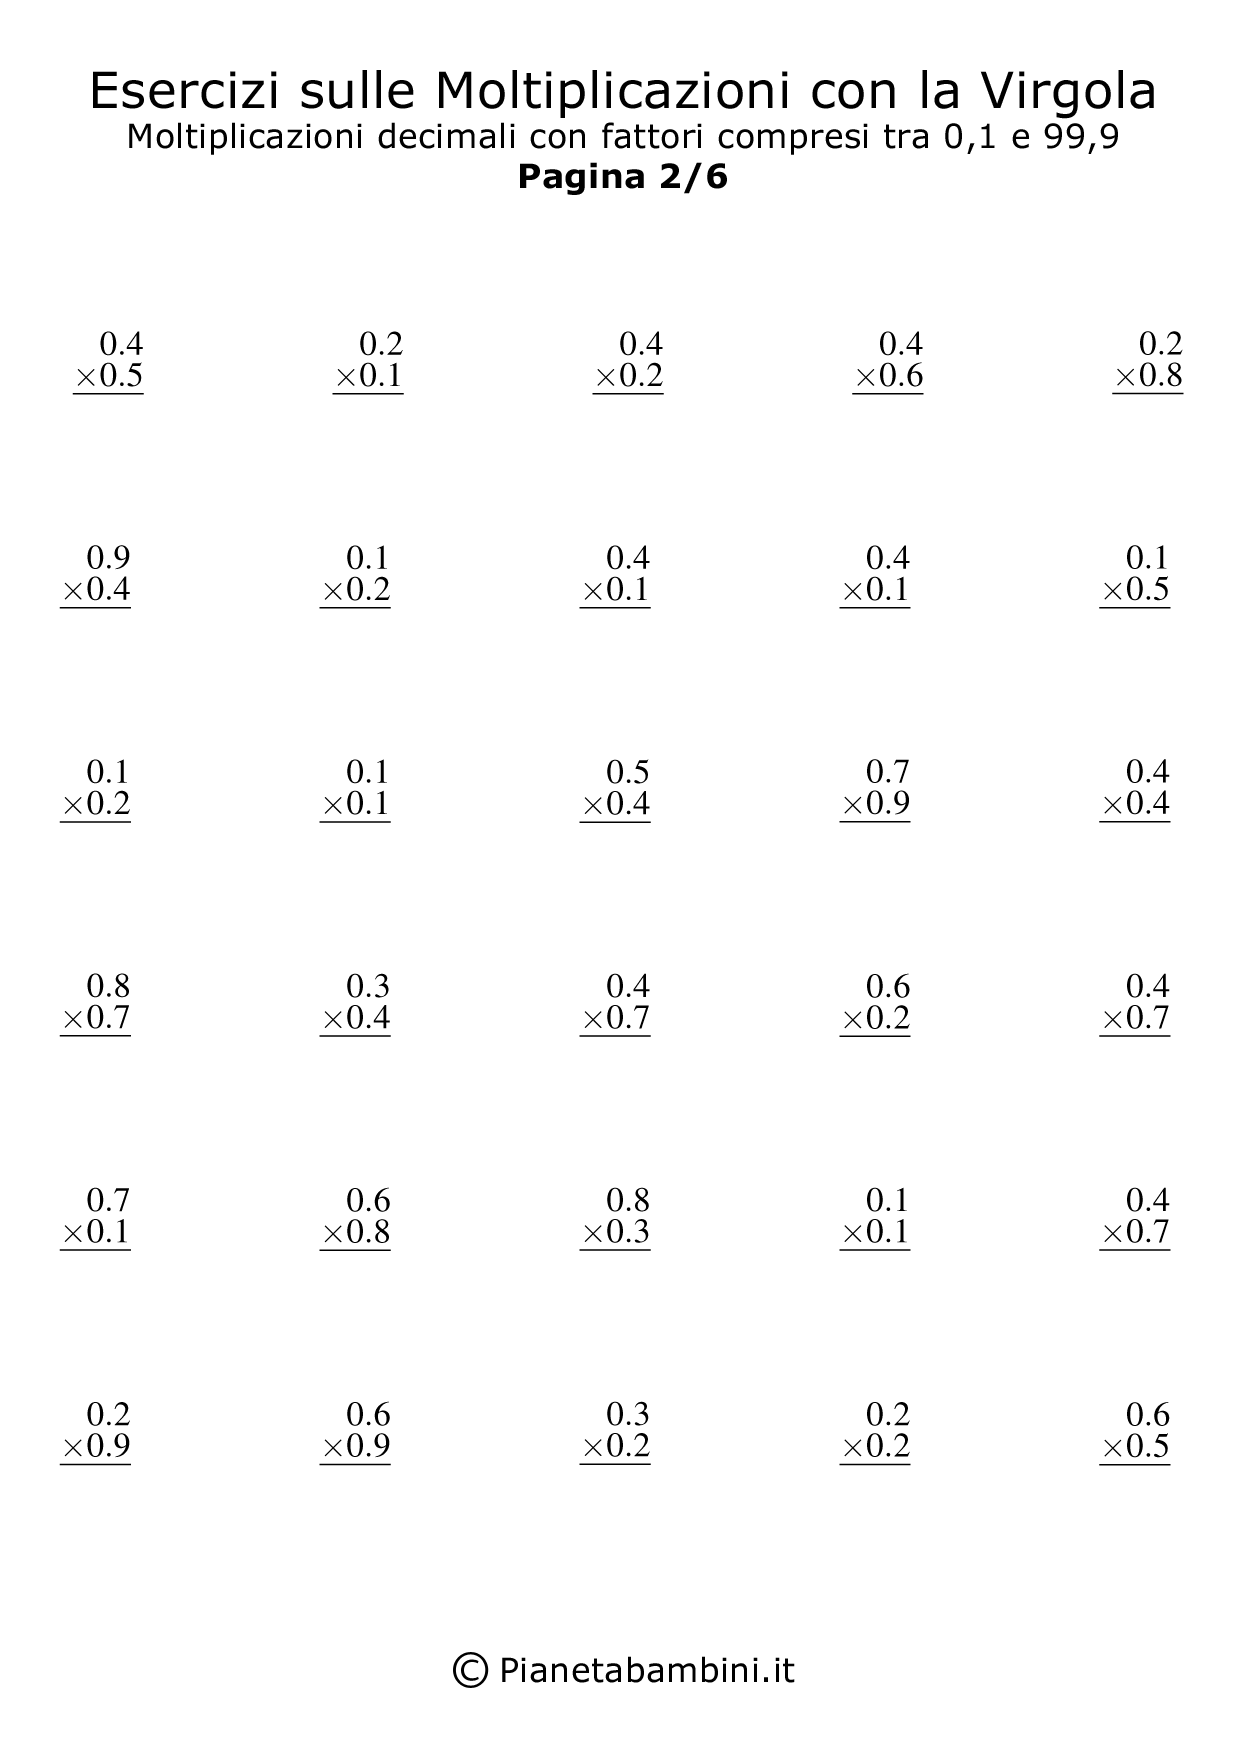 Moltiplicazioni-Virgola-0.1-99.9_2